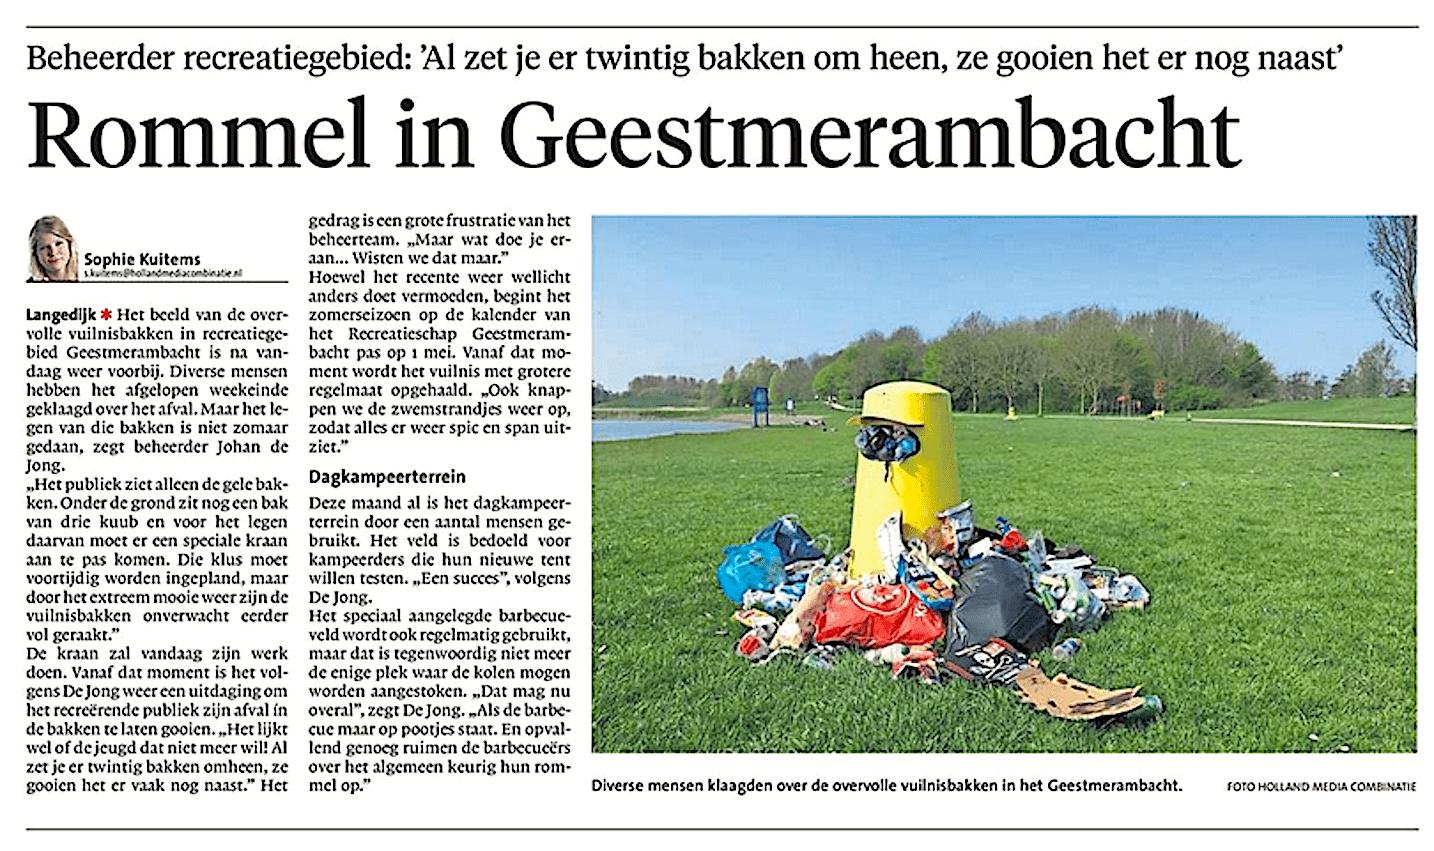 Alkmaarse Courant, 25 april 2018